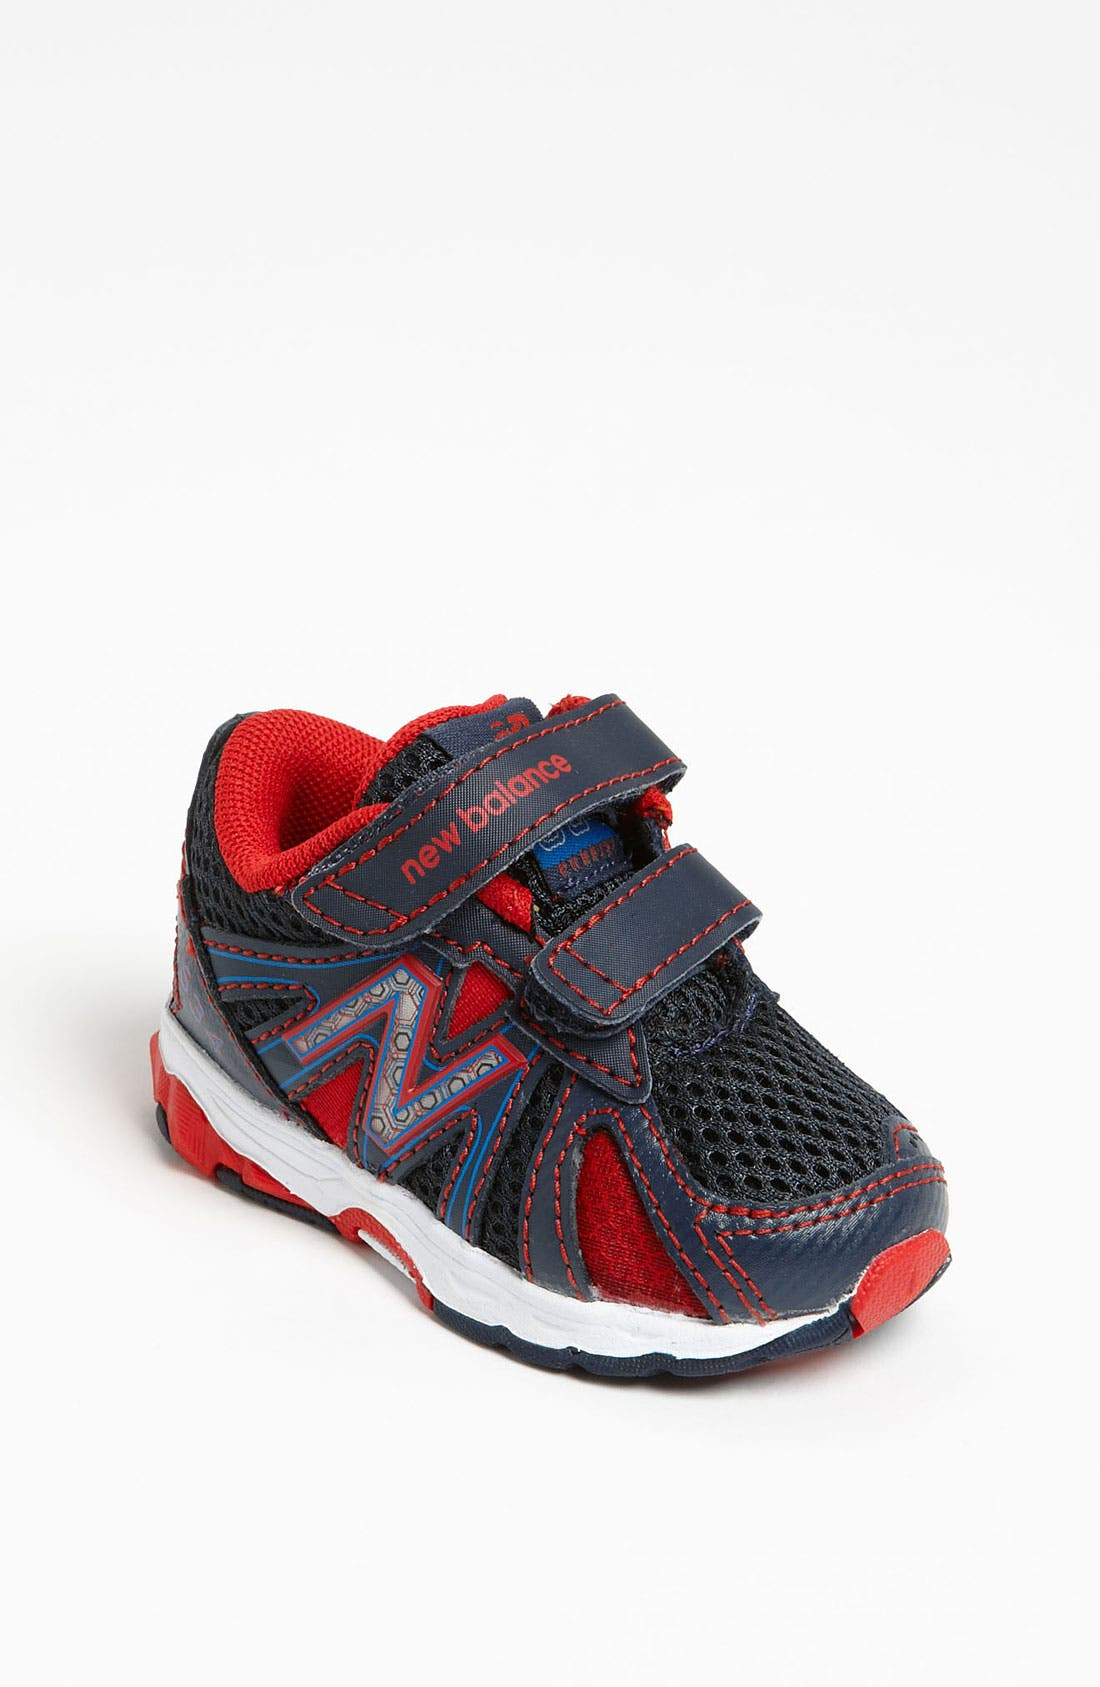 Main Image - New Balance '634' Running Shoe (Baby, Walker, & Toddler)